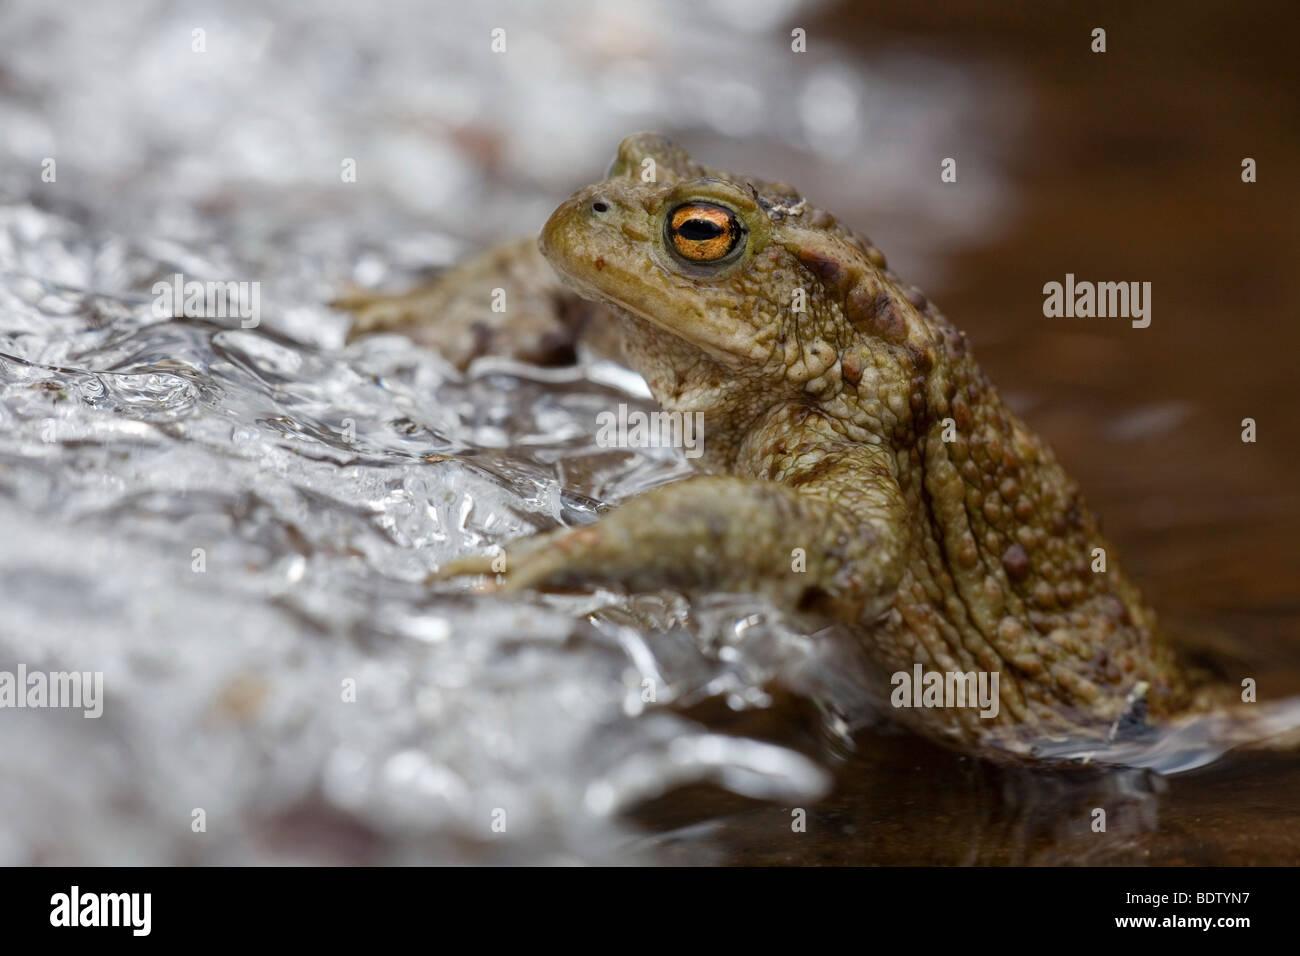 Erdkroete an Eiskante, Common Toad at sheet of ice (Bufo bufo) Stock Photo